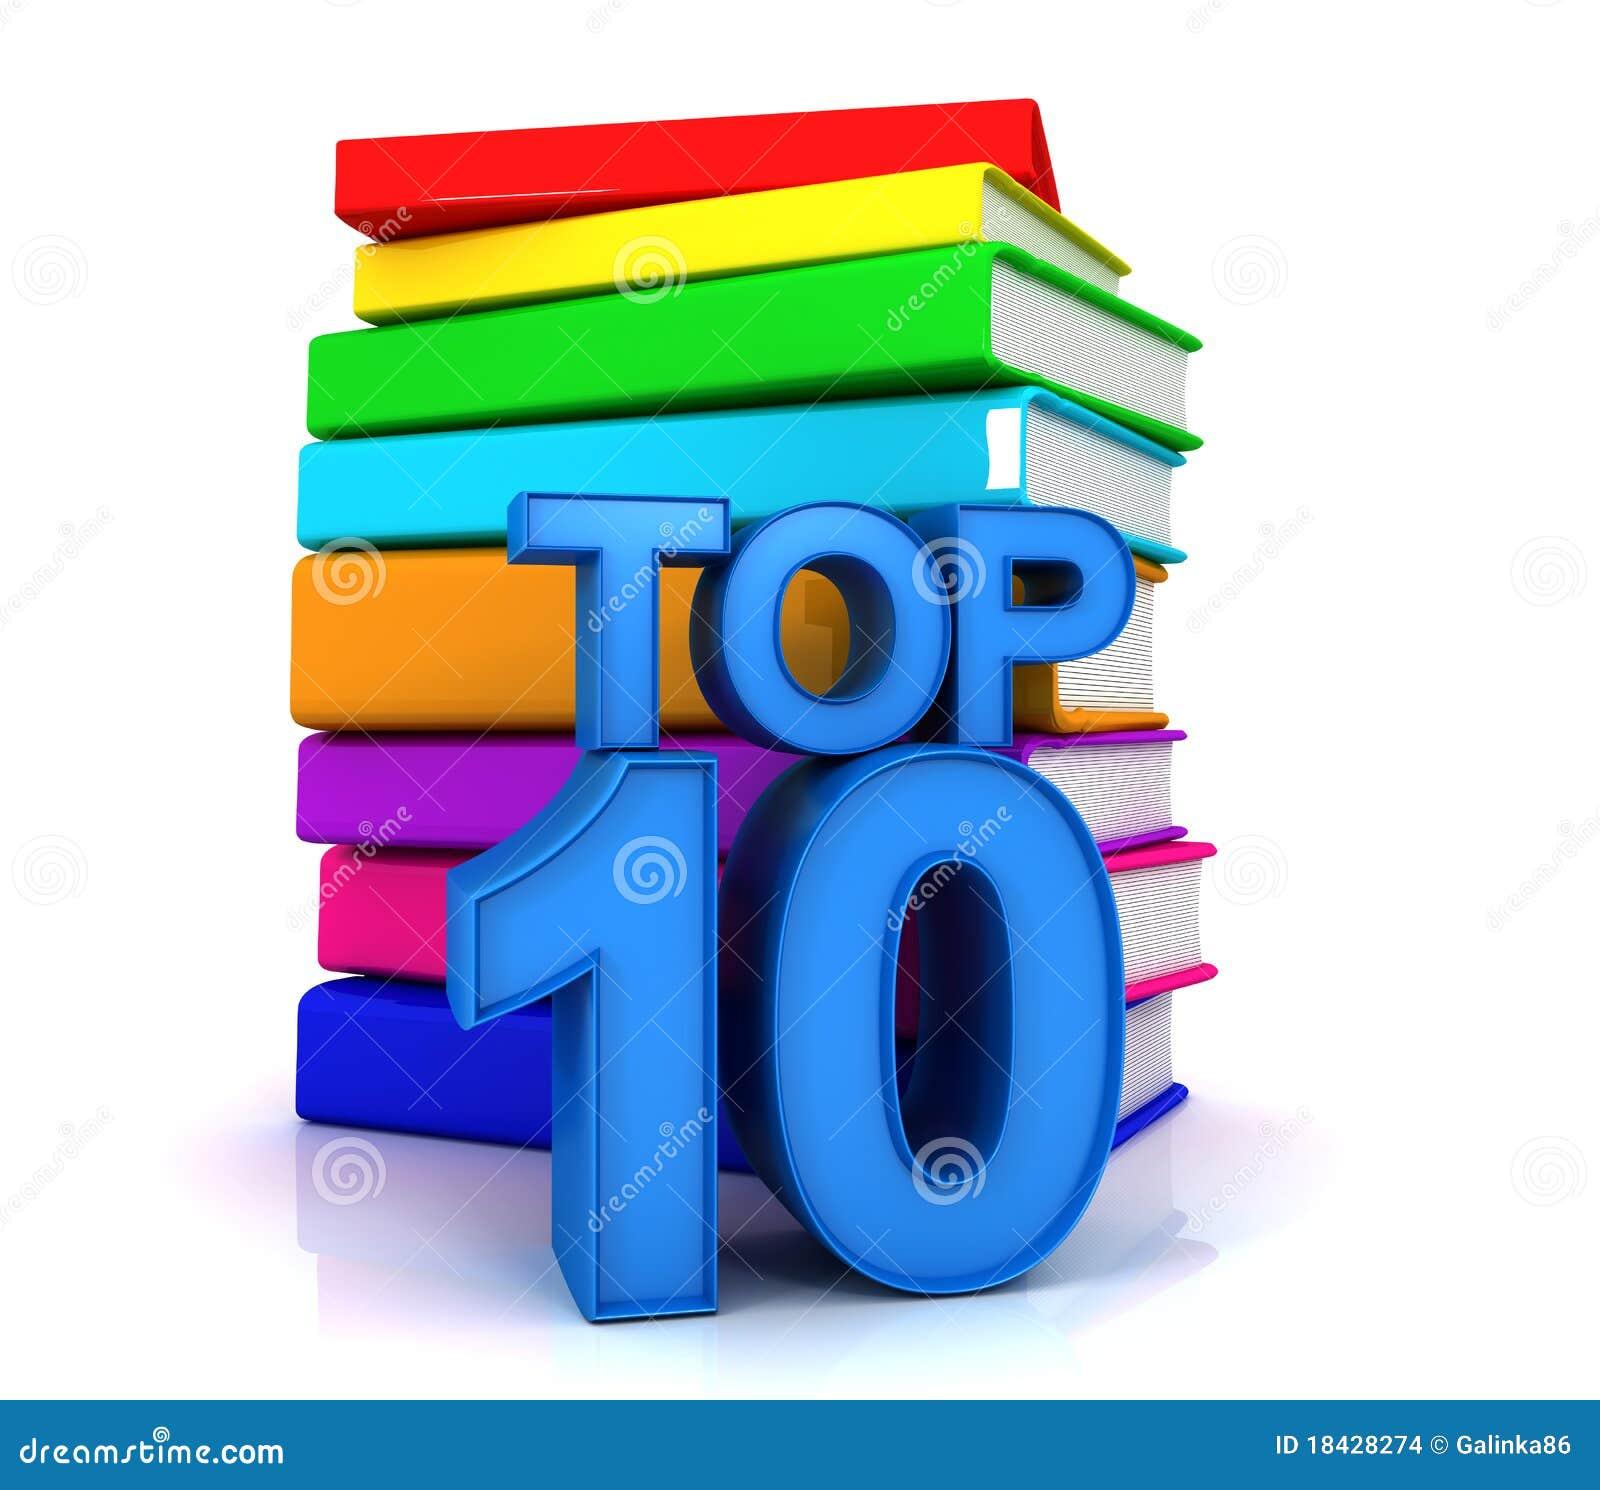 Illustration top10 business